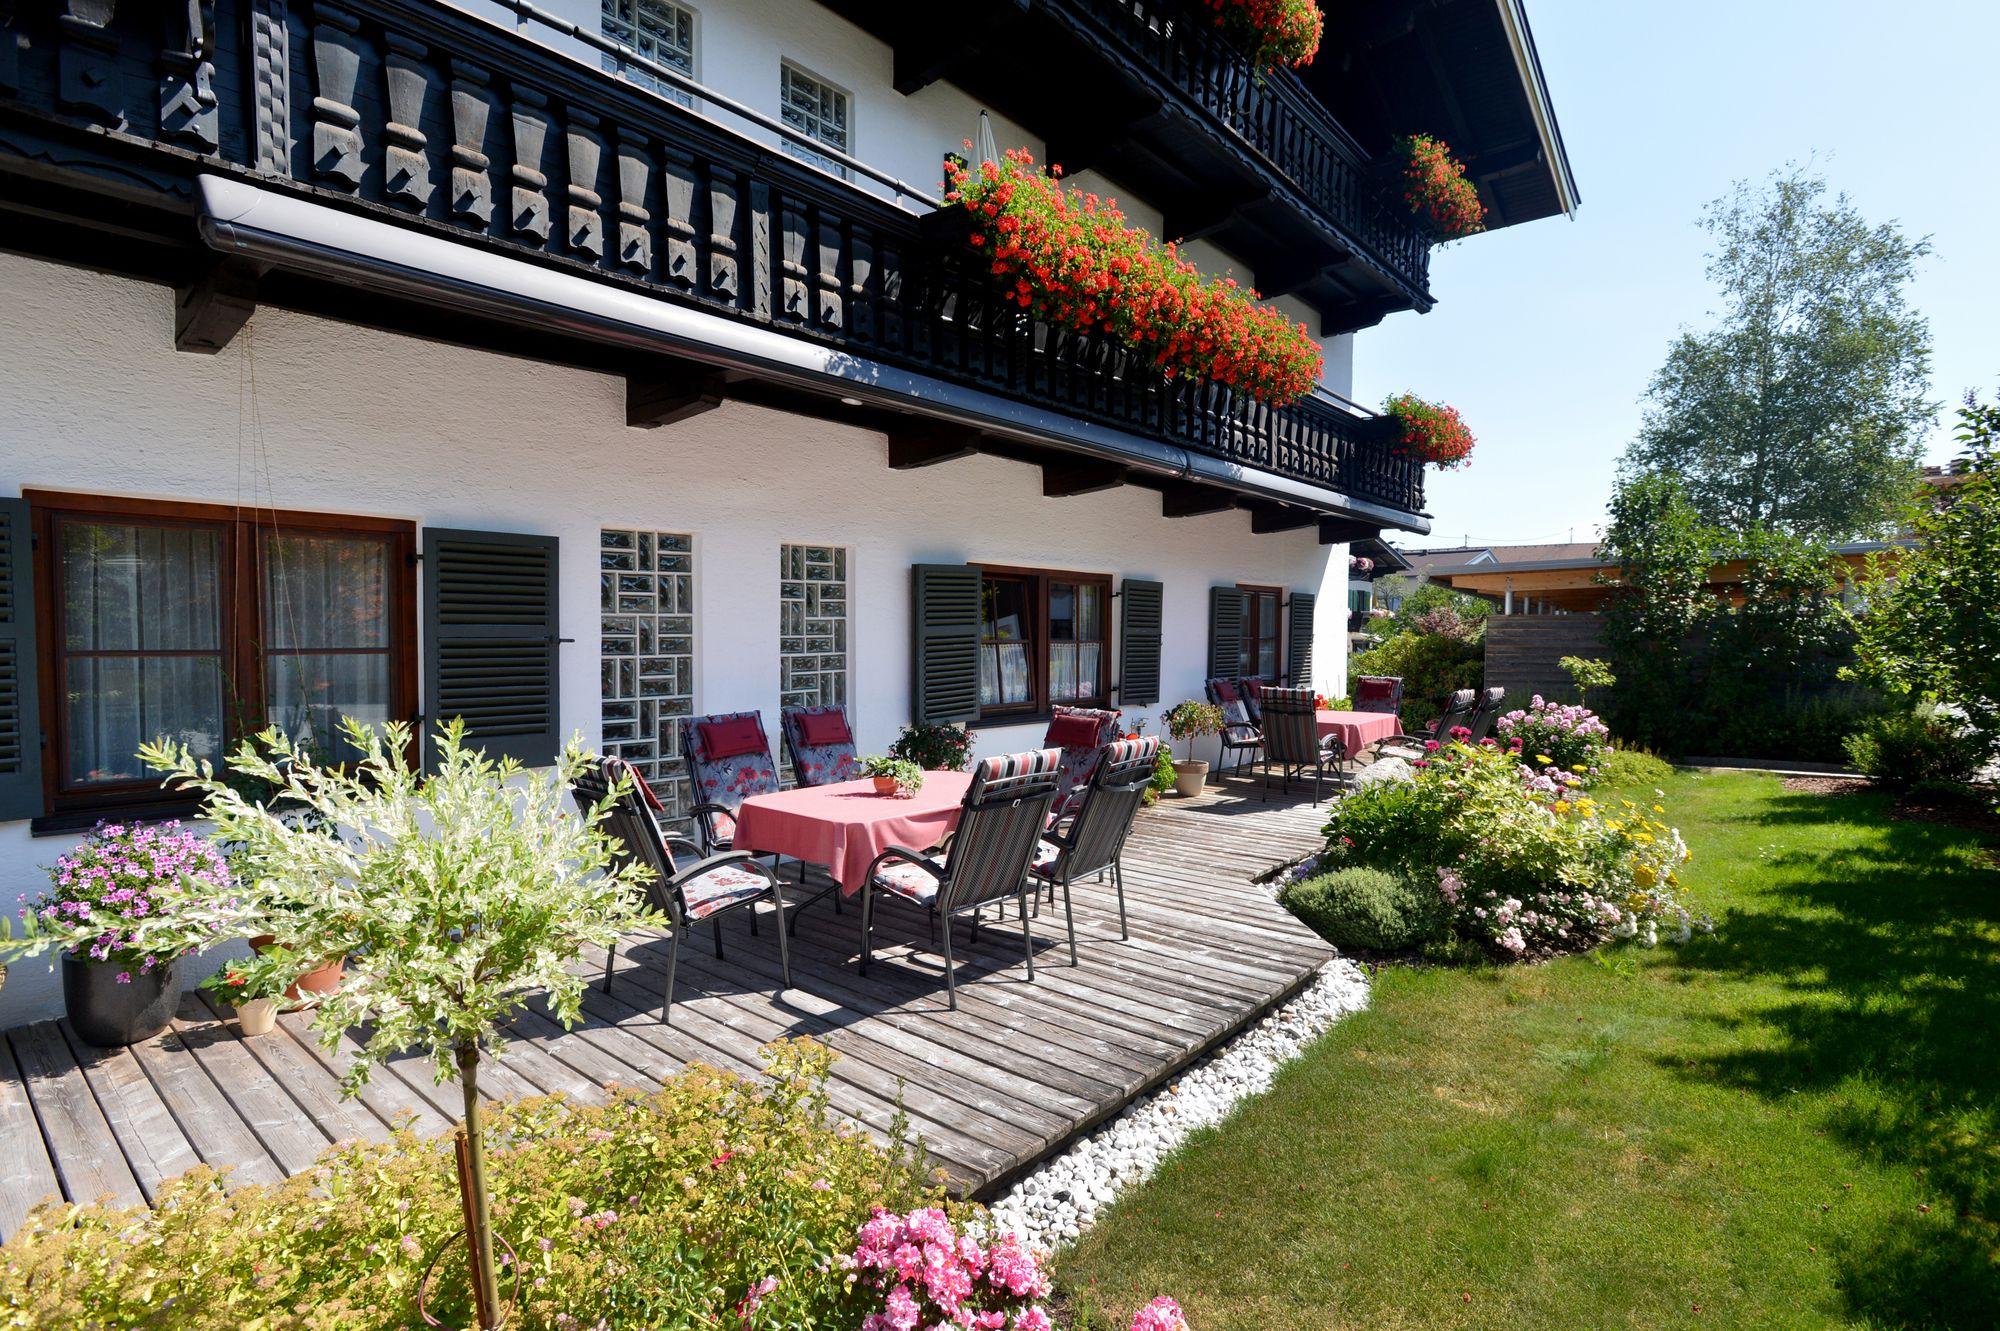 Brixen Events ab 22.06.2020 Party, Events, Veranstaltungen